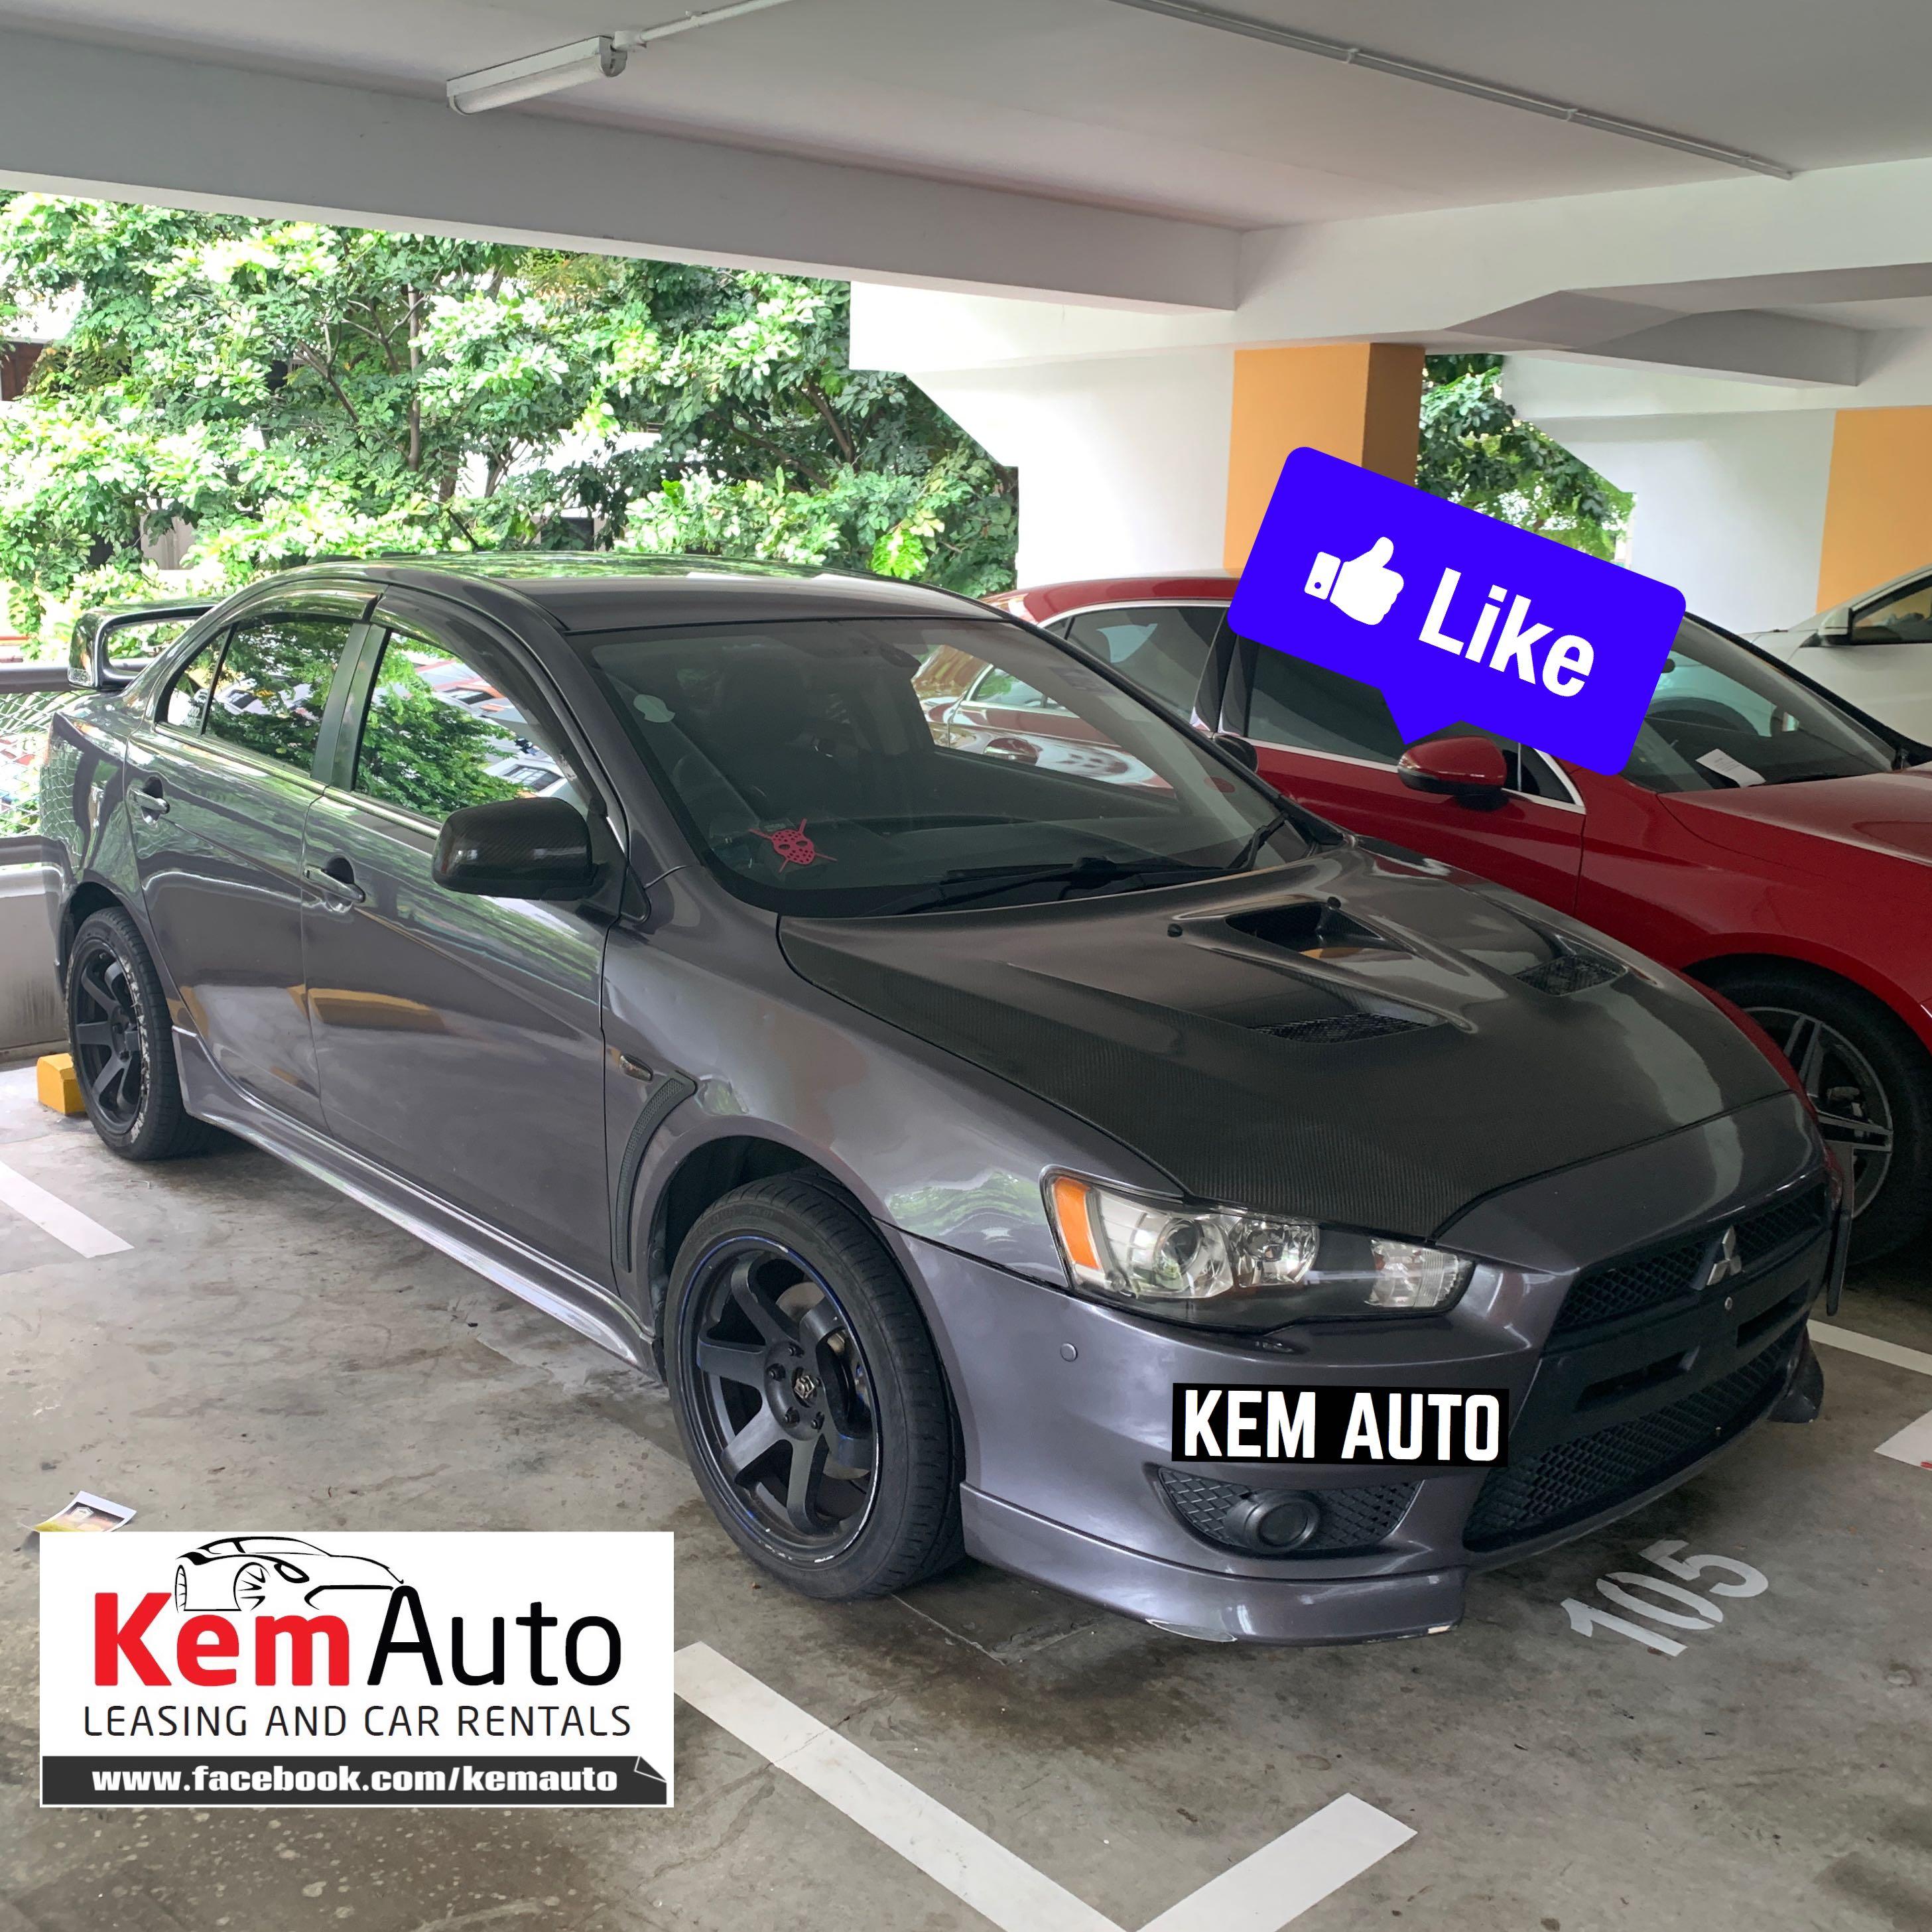 Circuit Breaker Car Rental Promo at Kem Auto (civic lancer glx EX integra bmw 320i Audi A4 Honda Fit Stream Toyota previa Axio Picnic Altis)